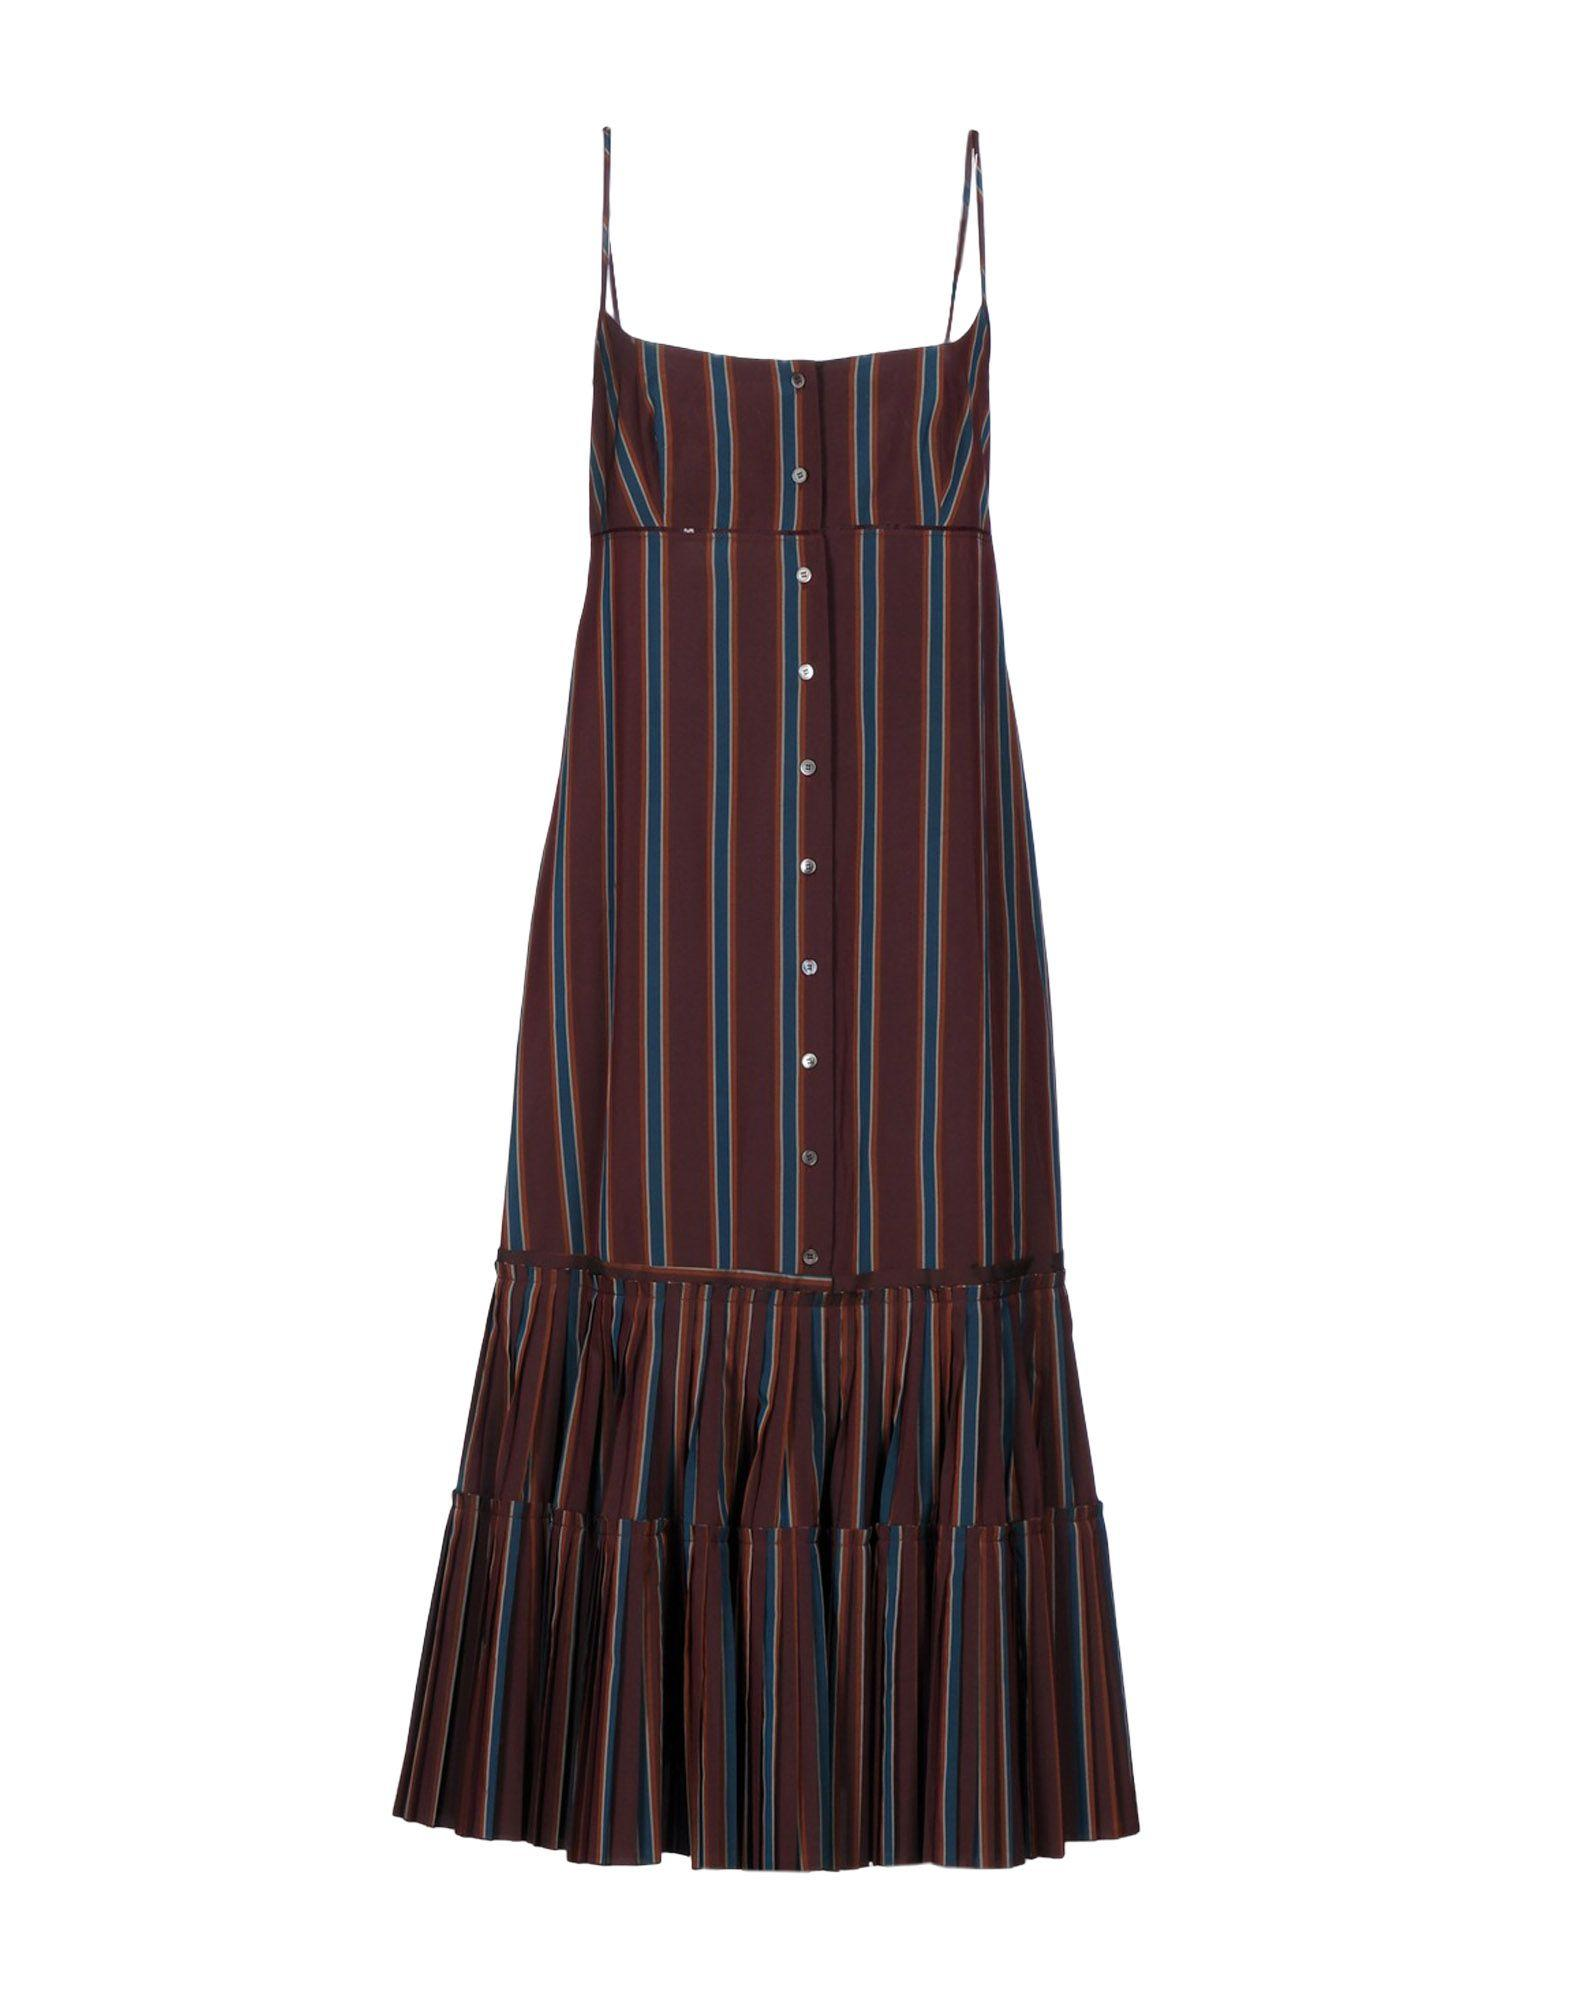 Brock Collection 3/4 Length Dresses In Deep Purple